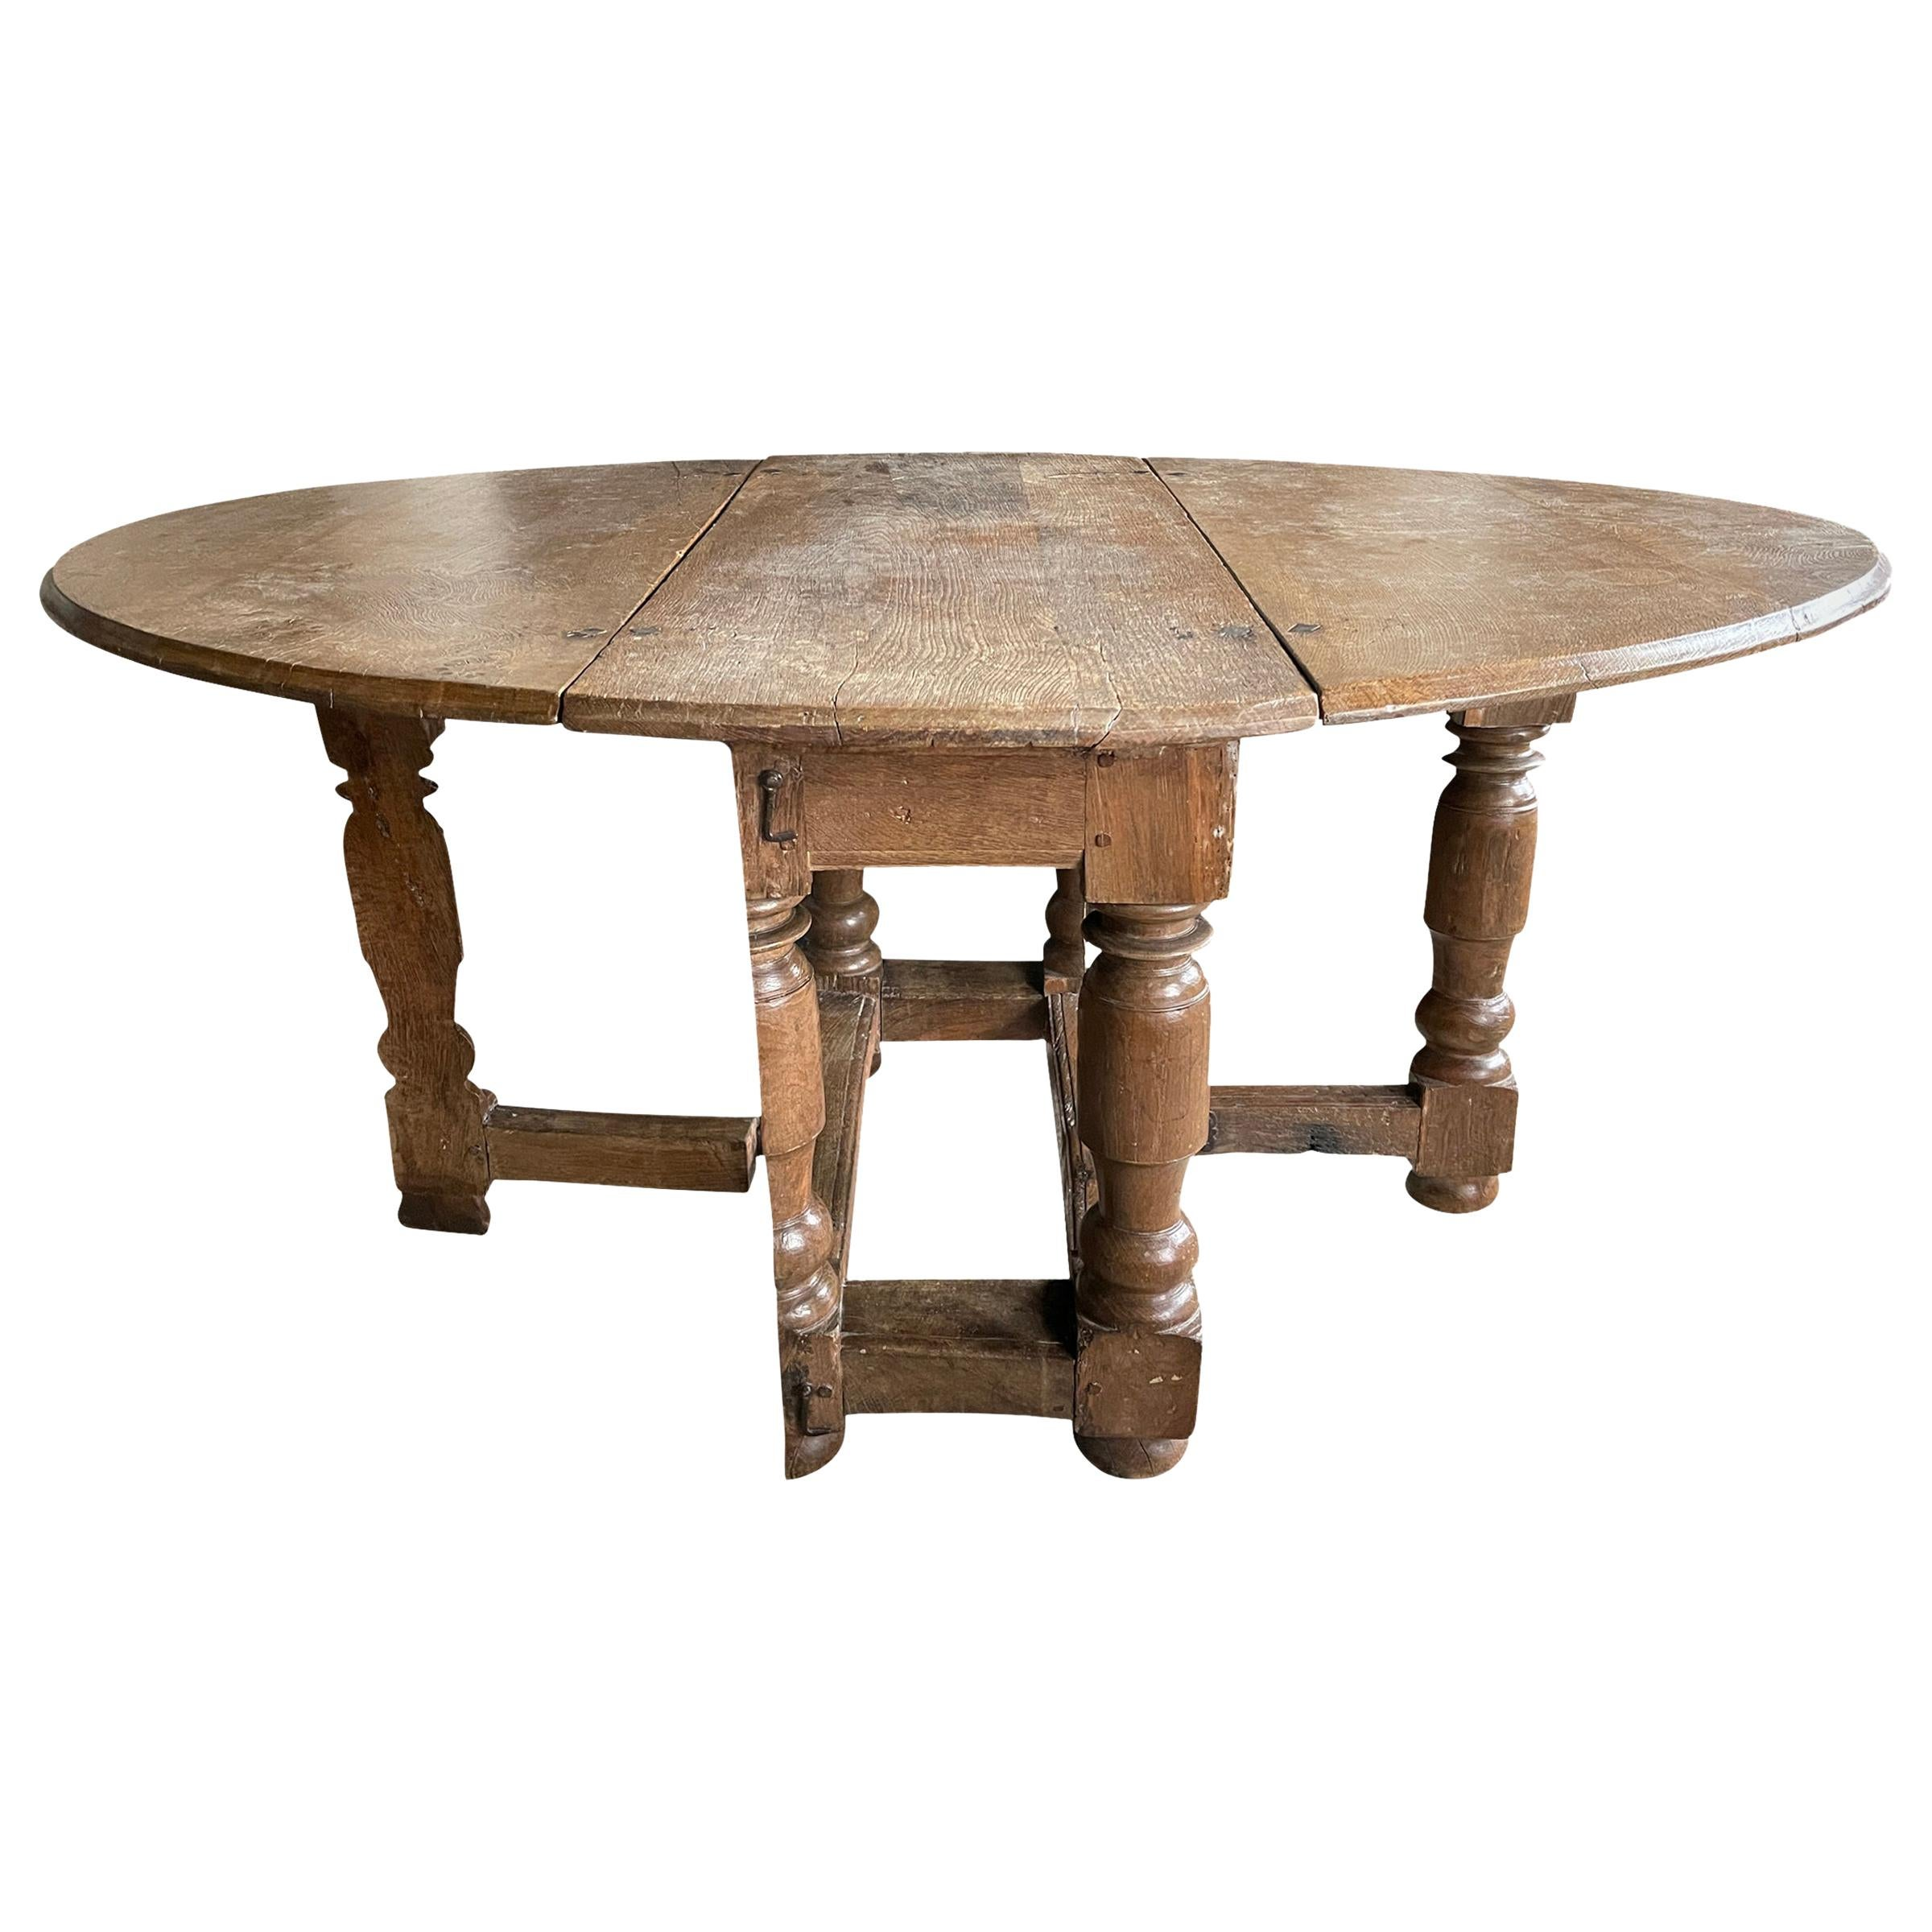 17th Century Danish Baroque Gateleg Table